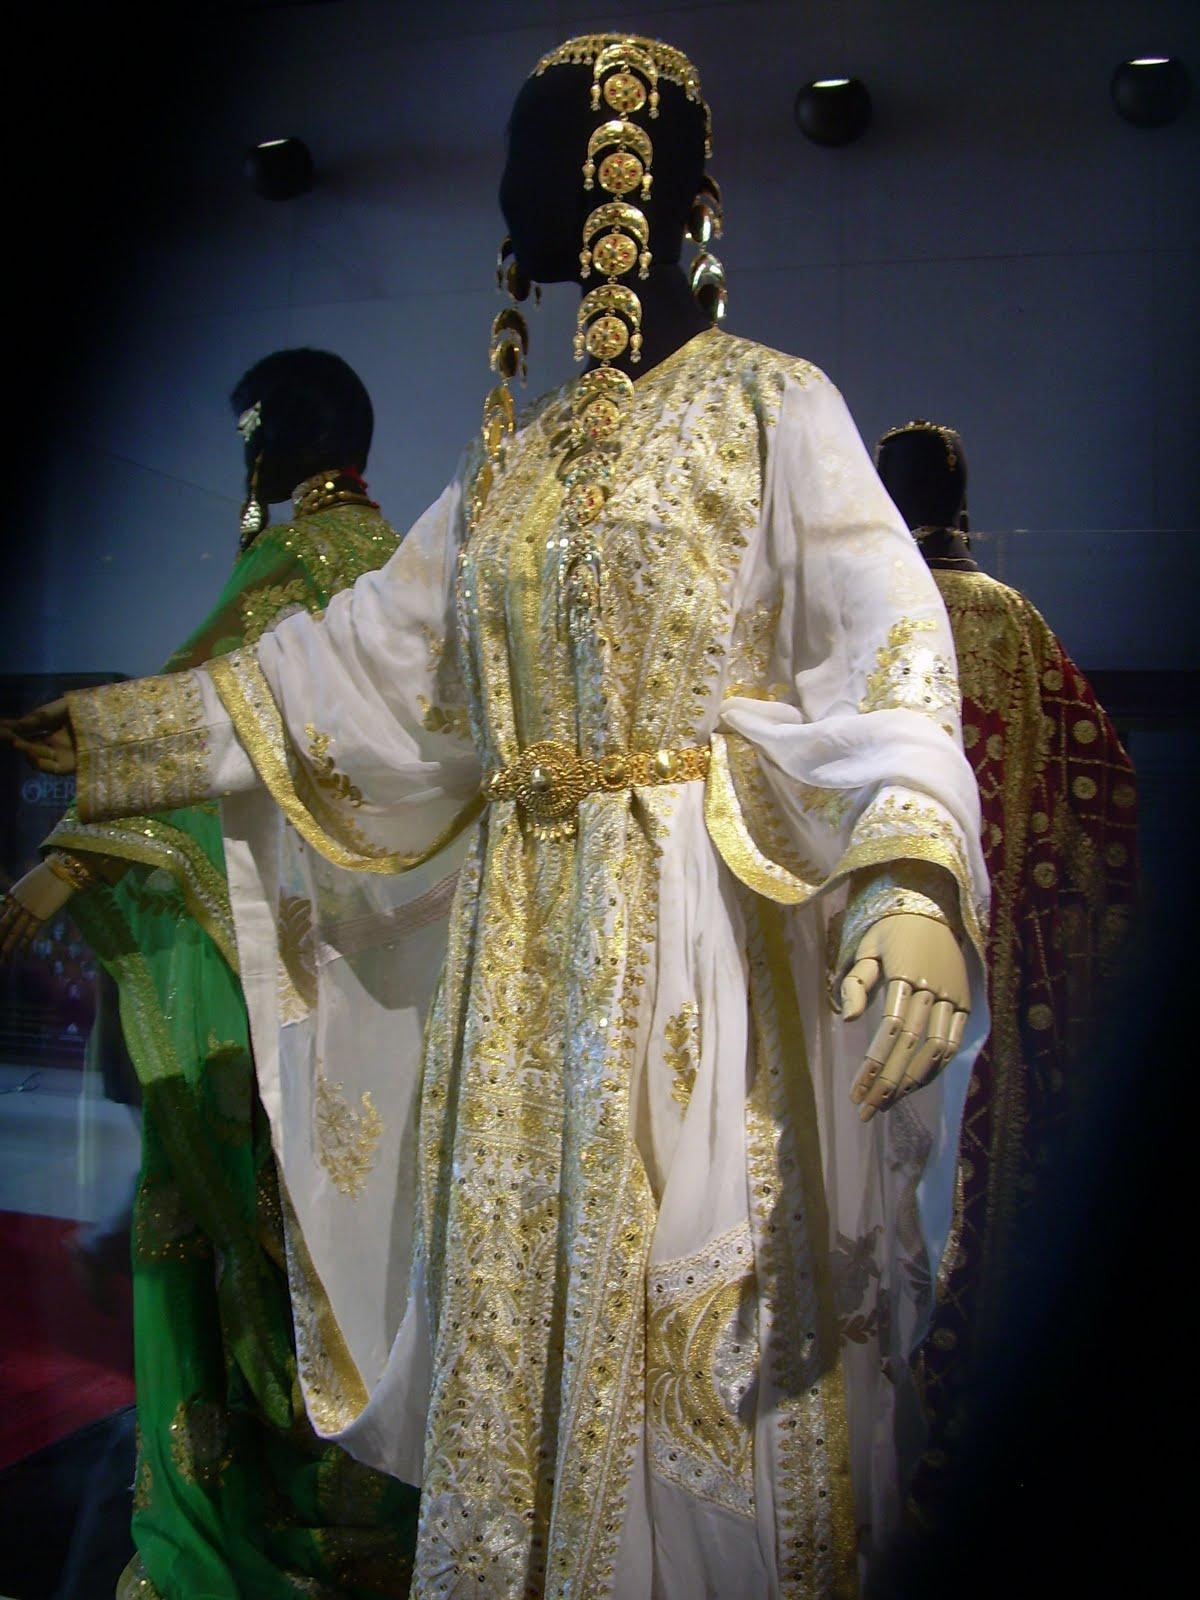 Wedding Dresses Qatar : Costume history is fun brides of the arab world kuwait and qatar